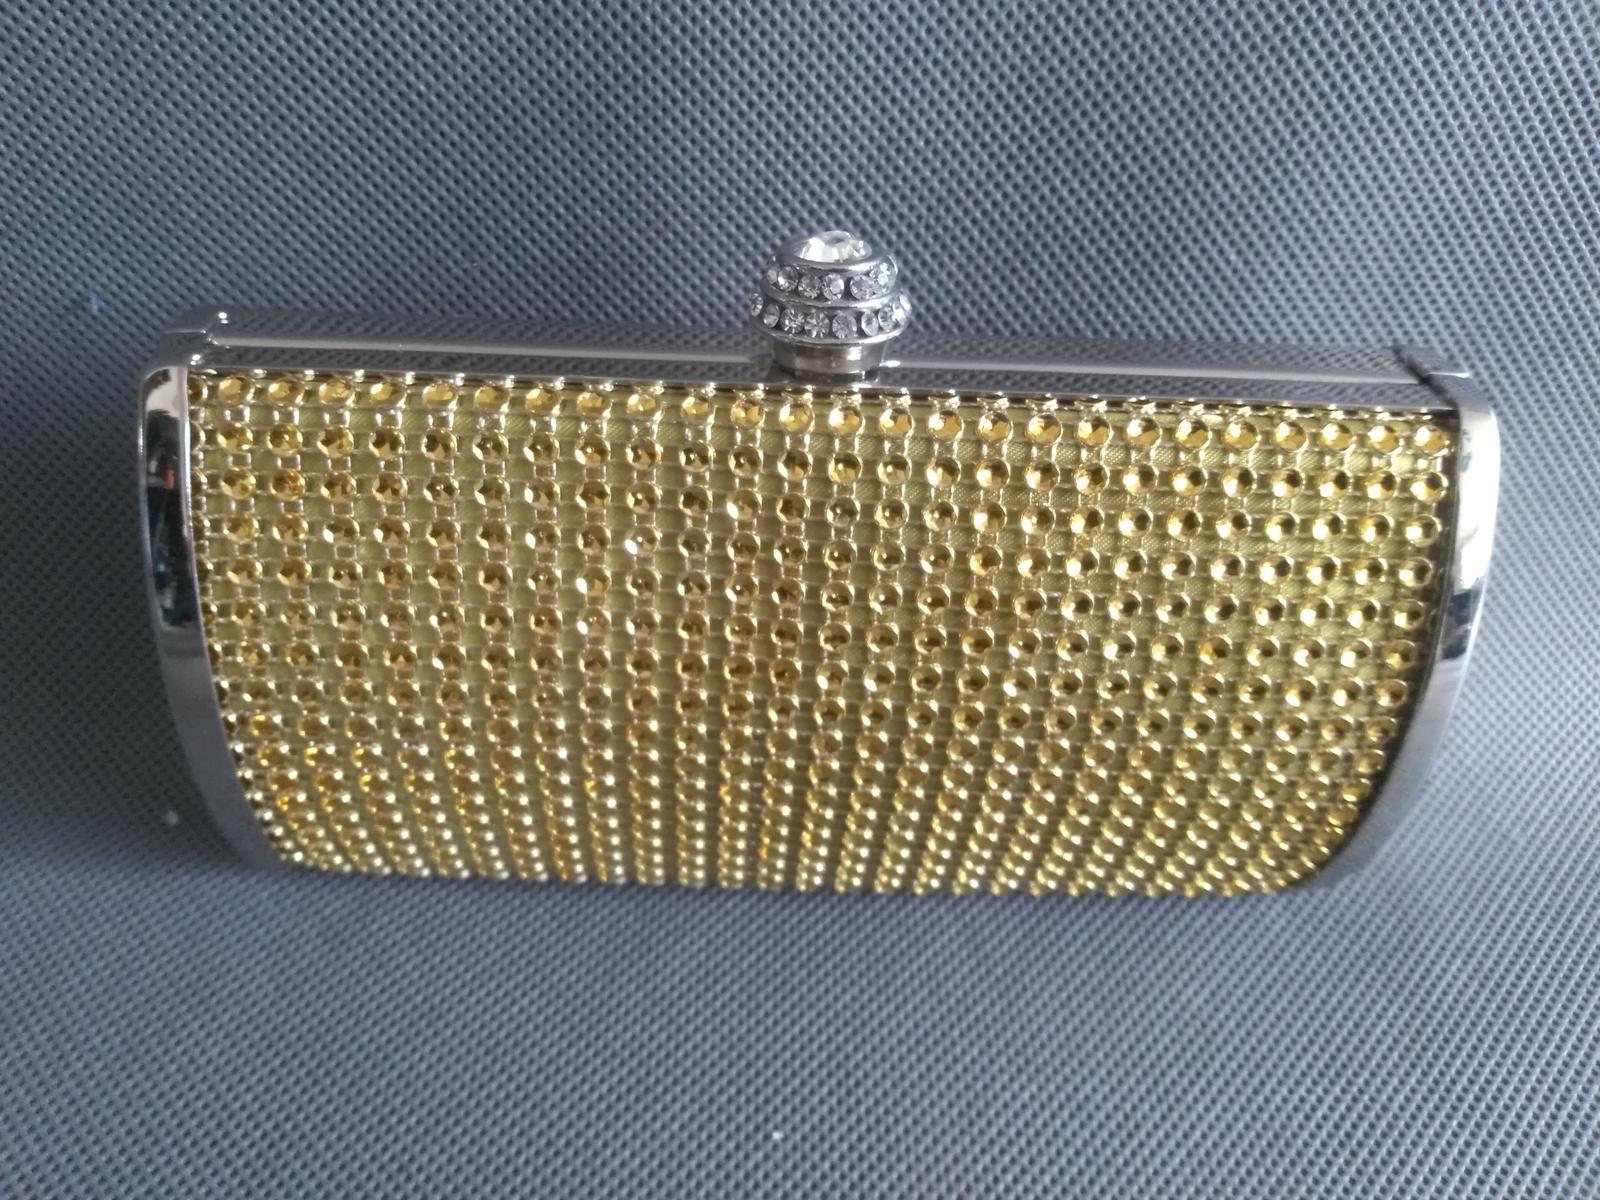 SKLADEM - zlatá kabelka - Obrázek č. 1